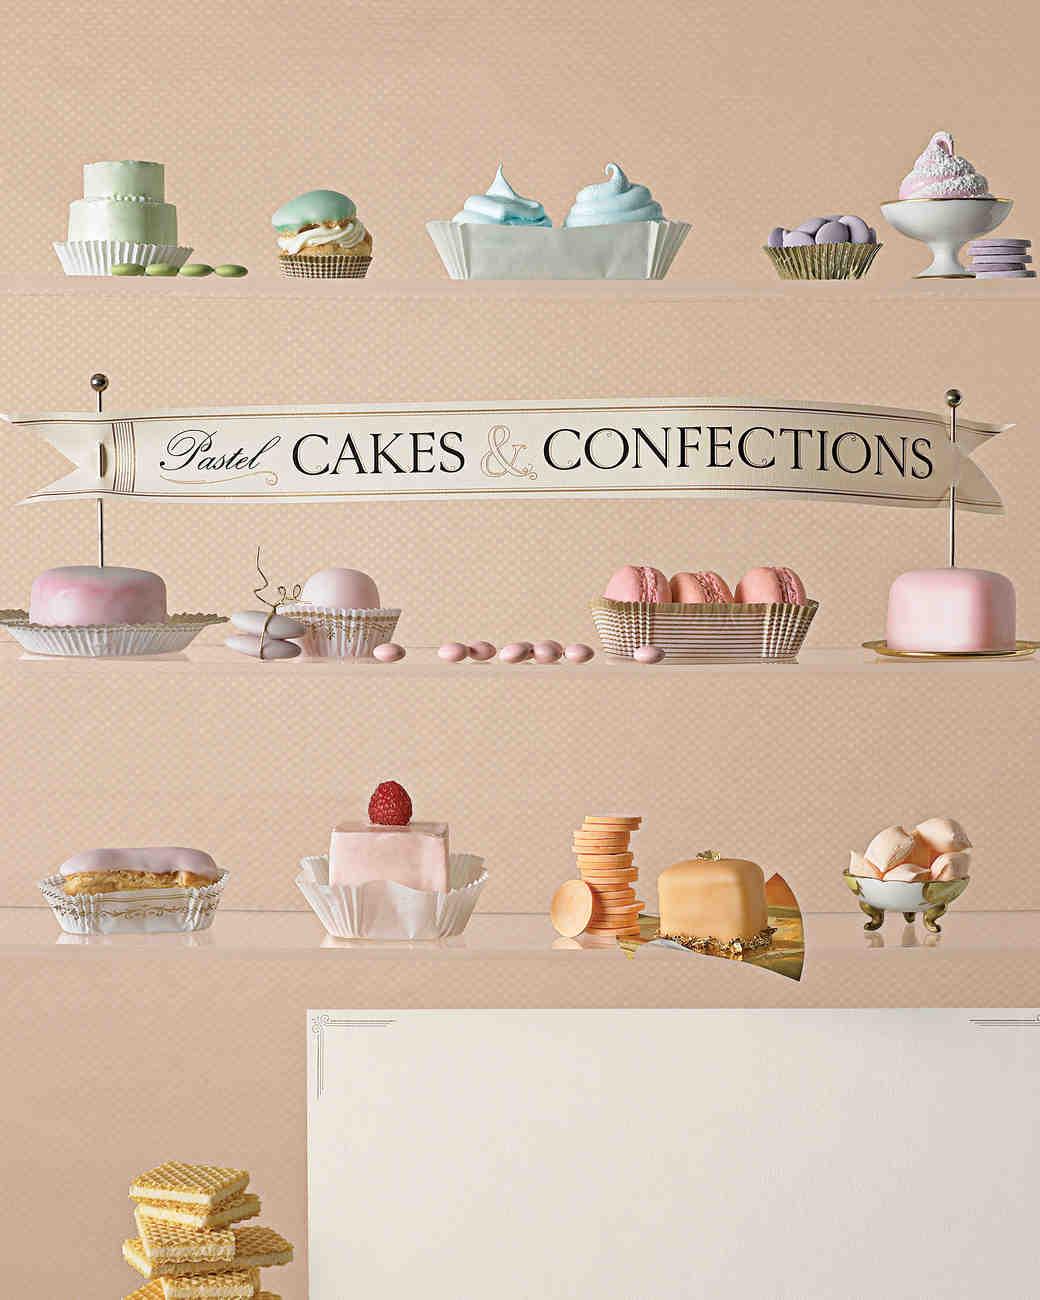 Cream Puffs and Mini Eclairs